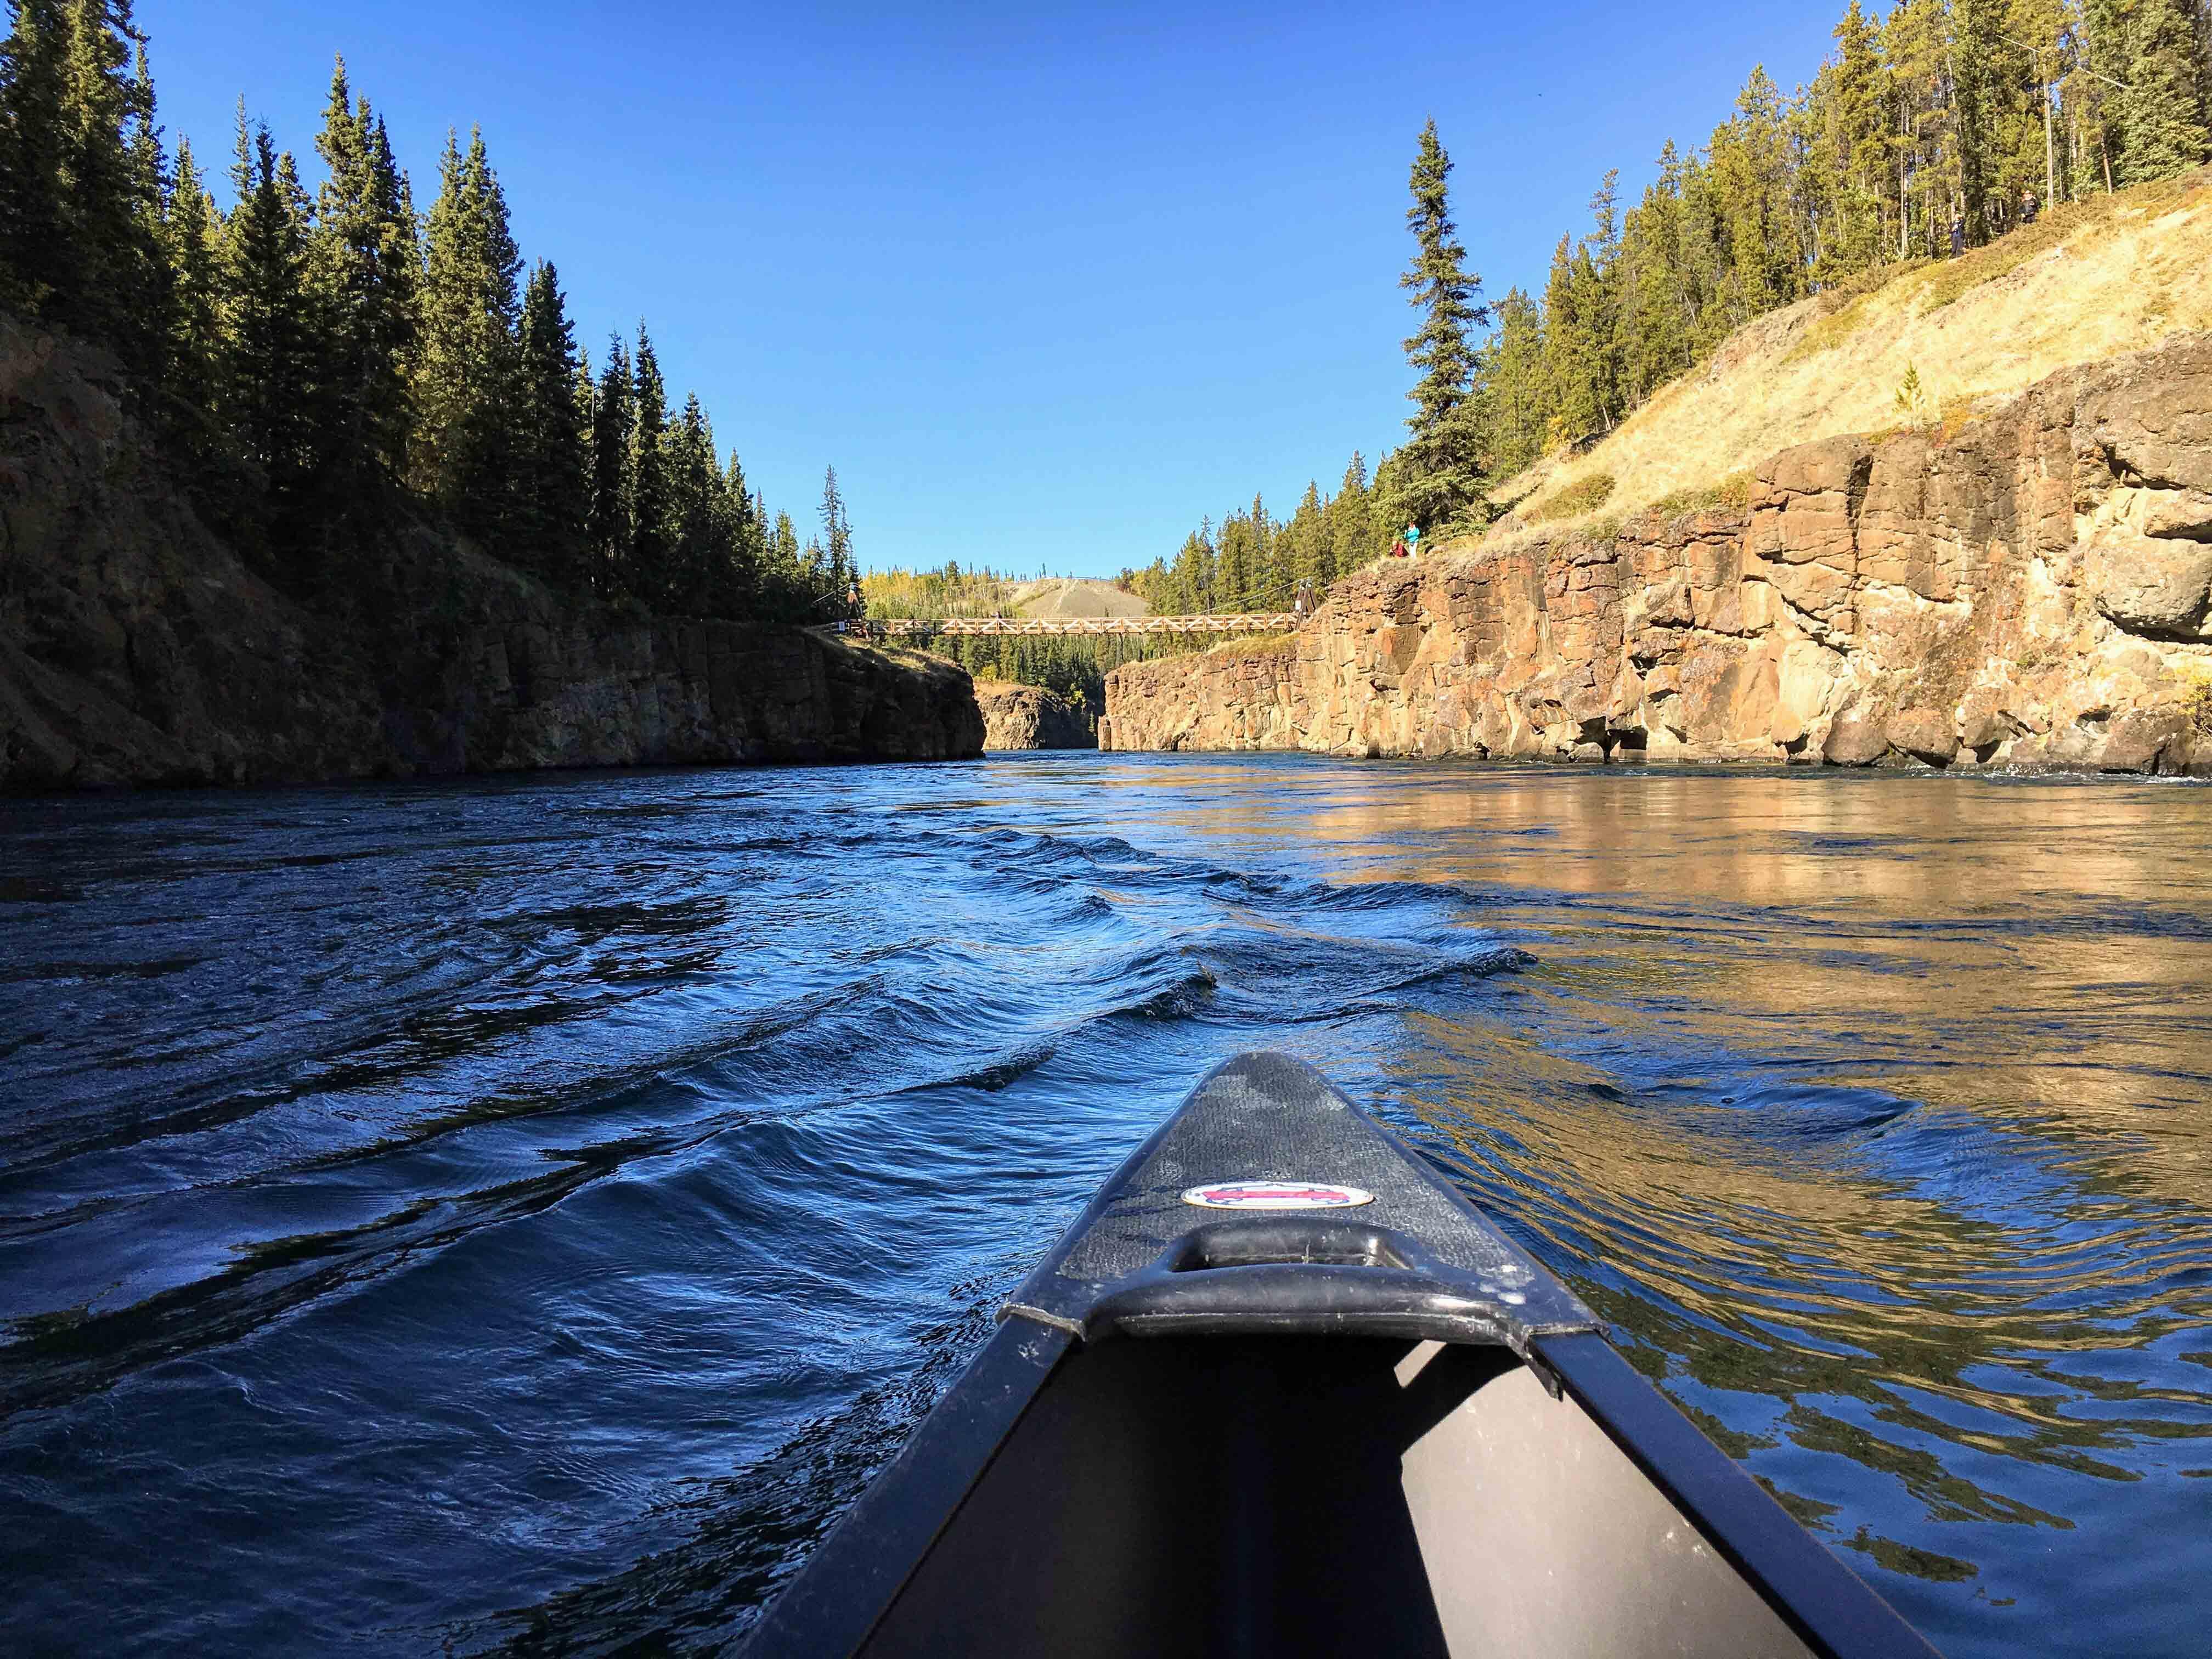 Navigating the Yukon River near Whitehorse